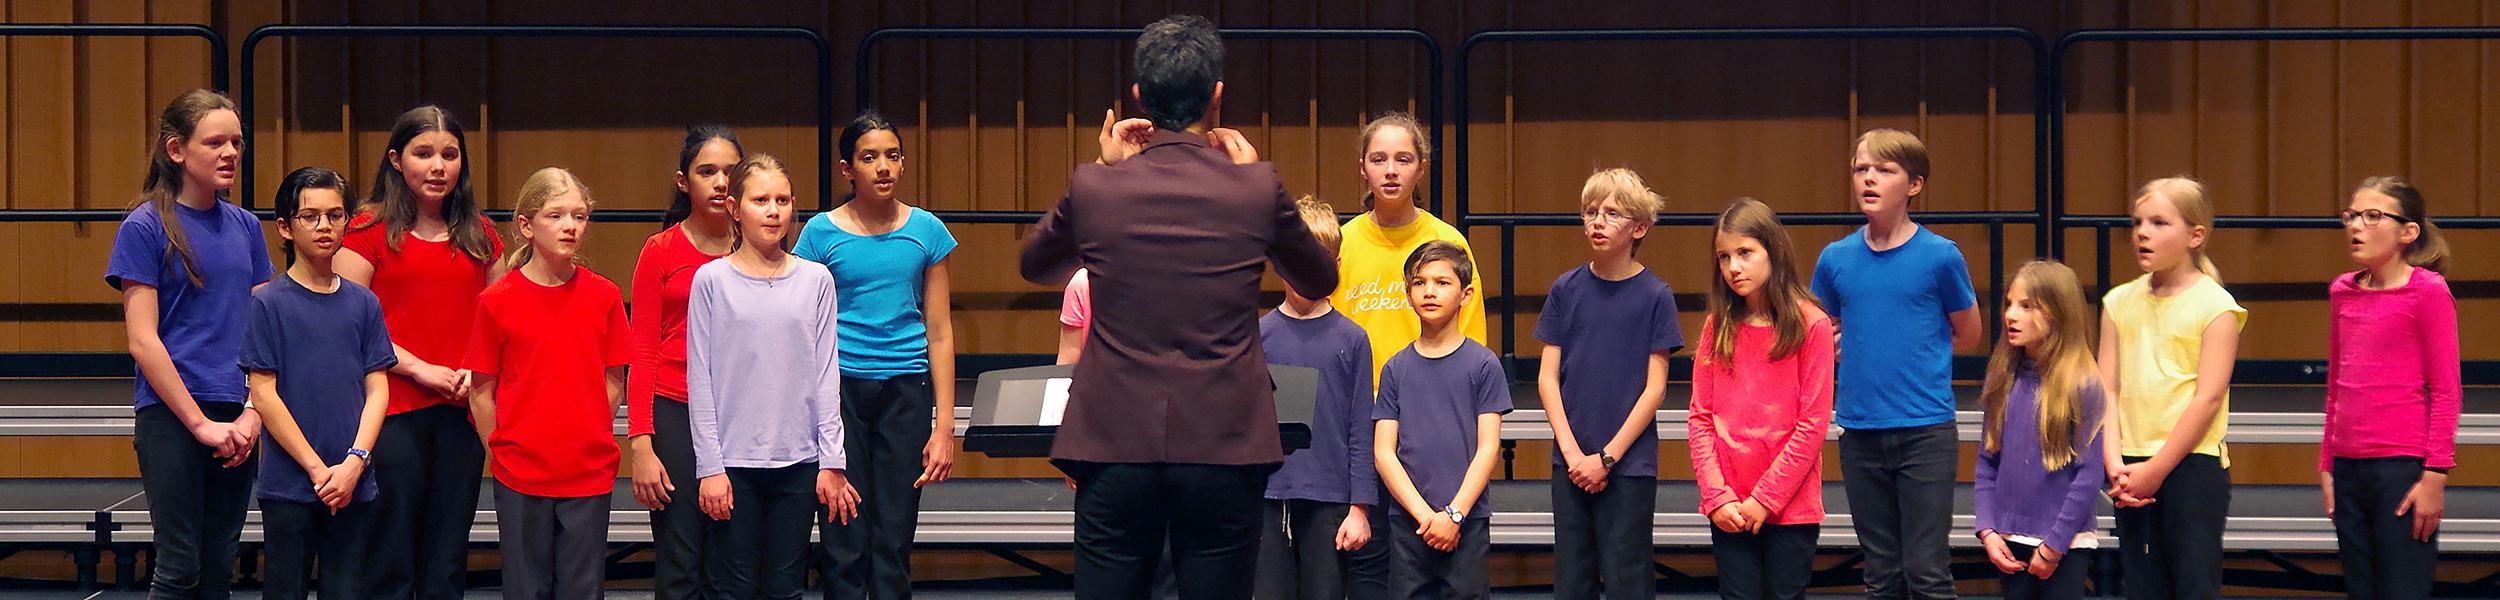 Choir performing.